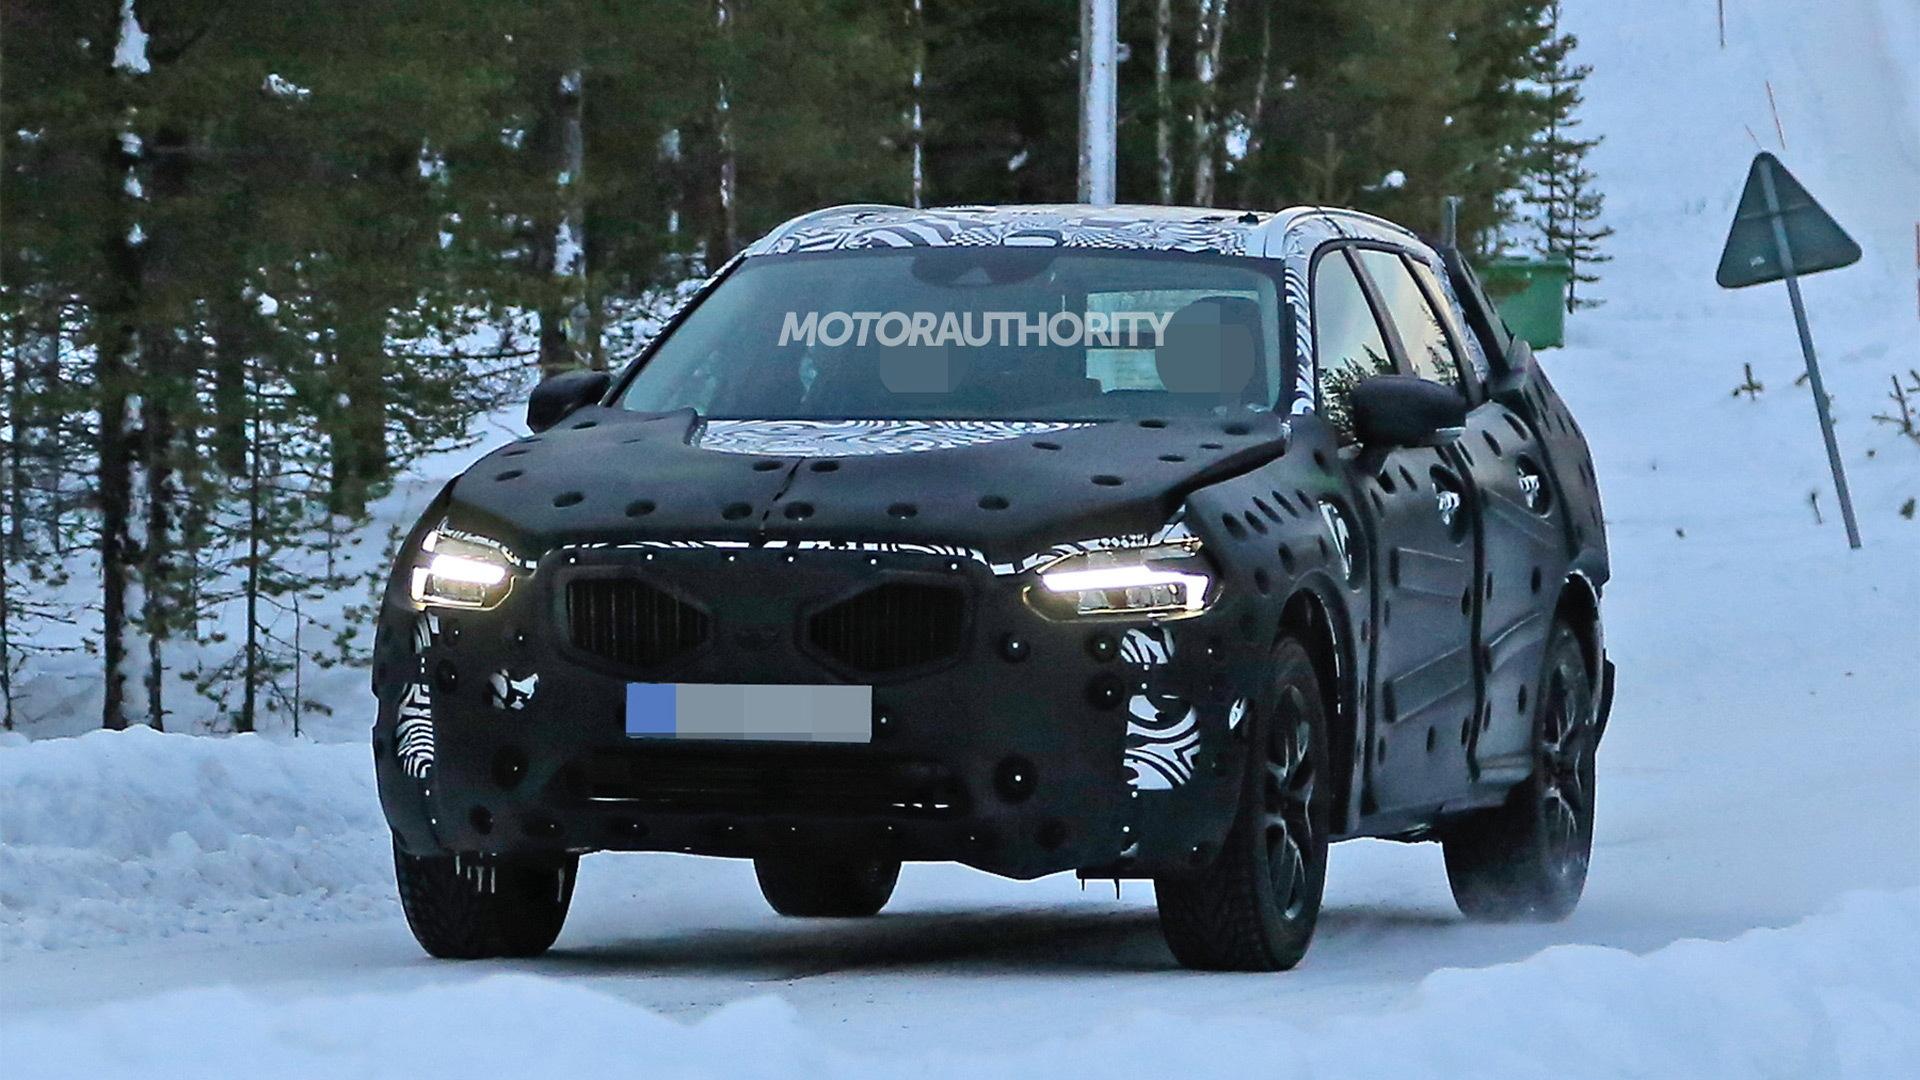 2018 Volvo XC60 spy shots - Image via S. Baldauf/SB-Medien